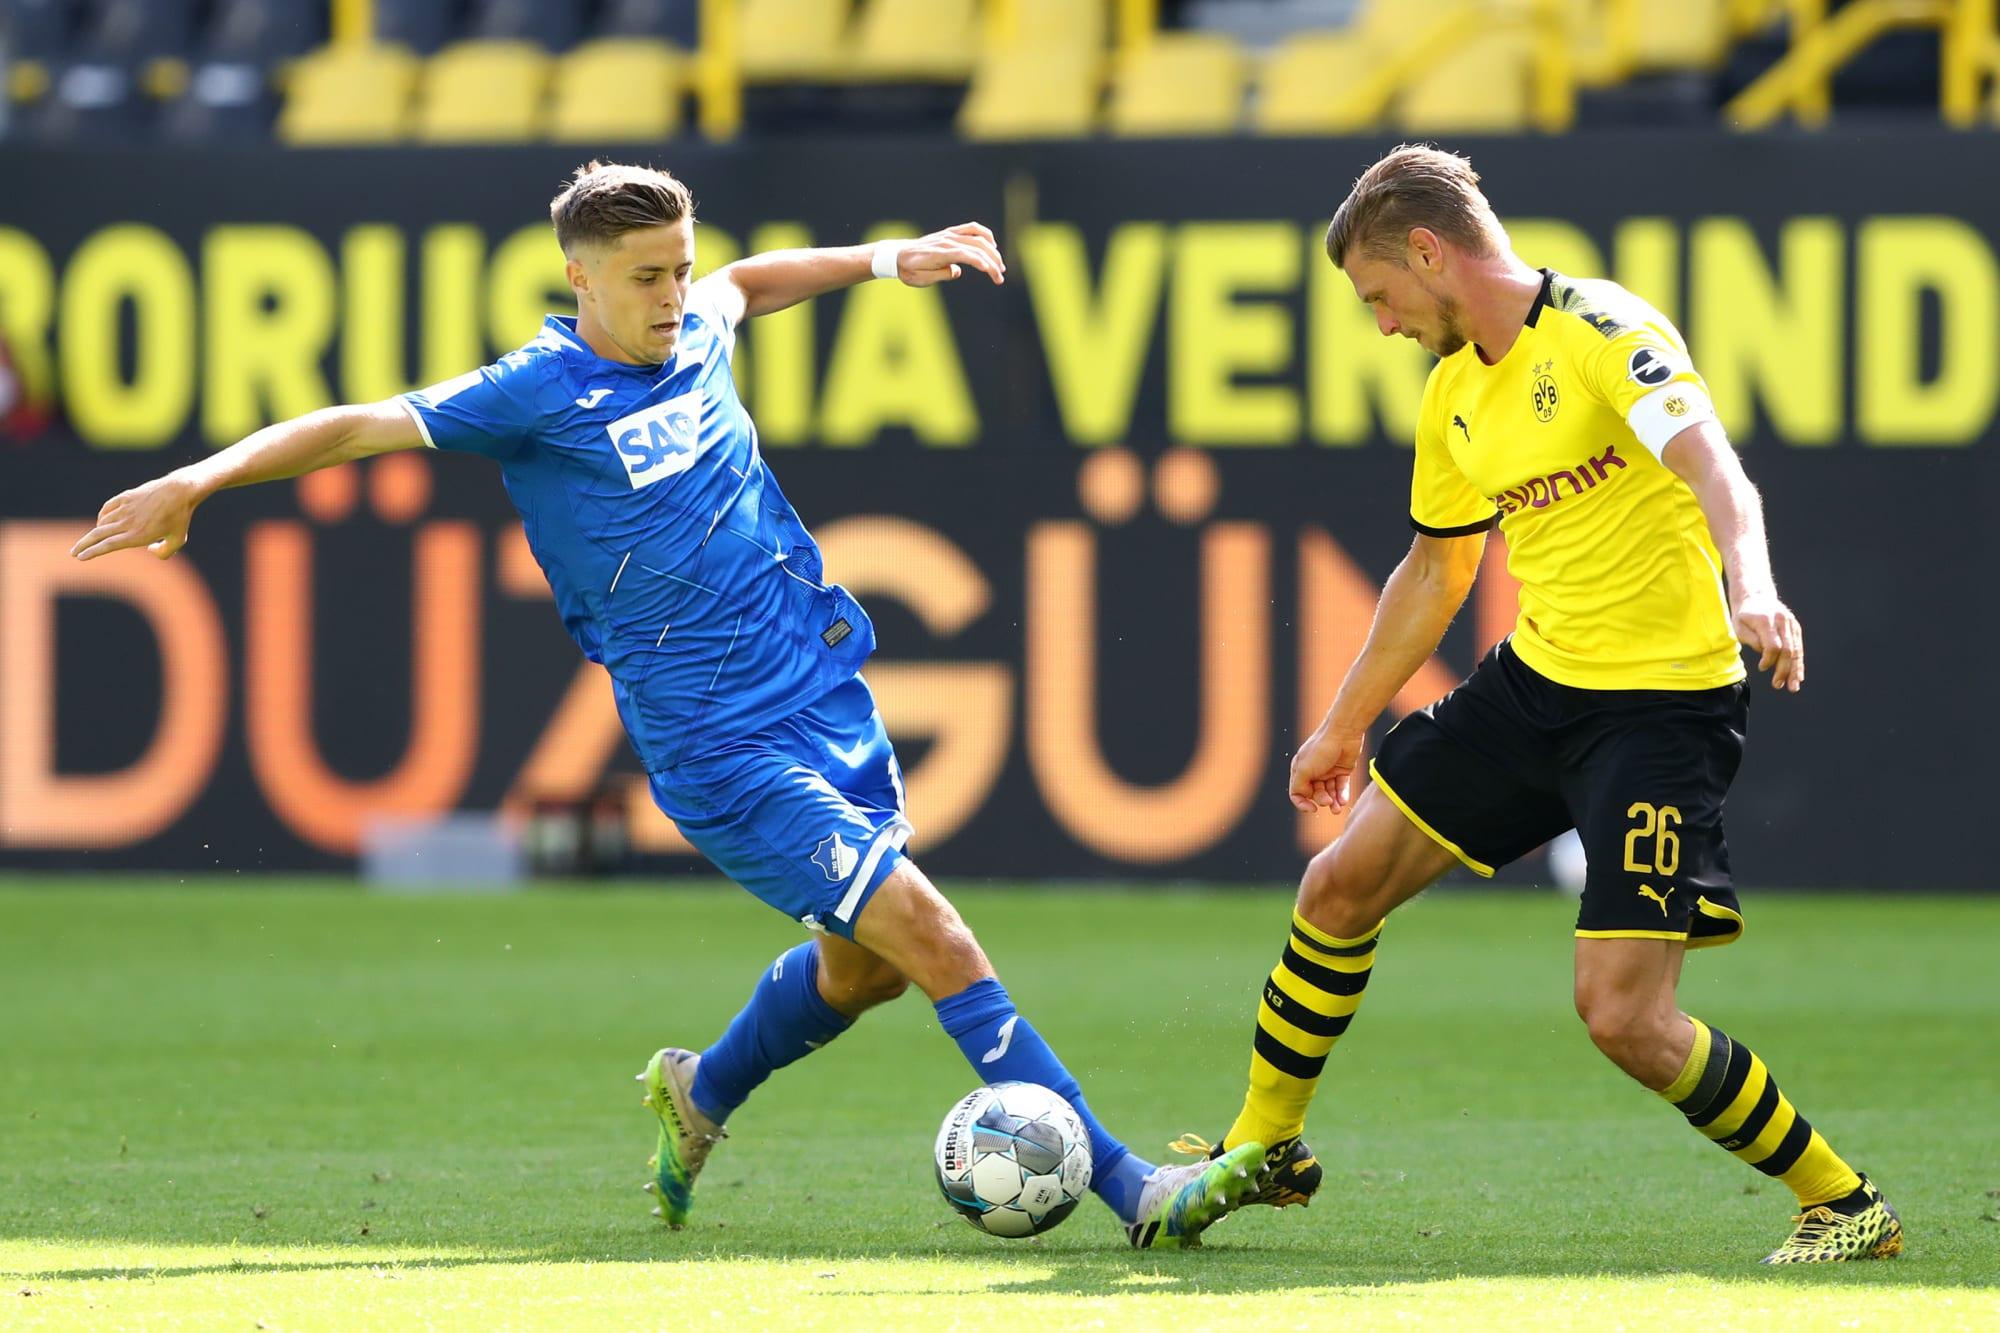 Hoffenheim Dortmund Livestream